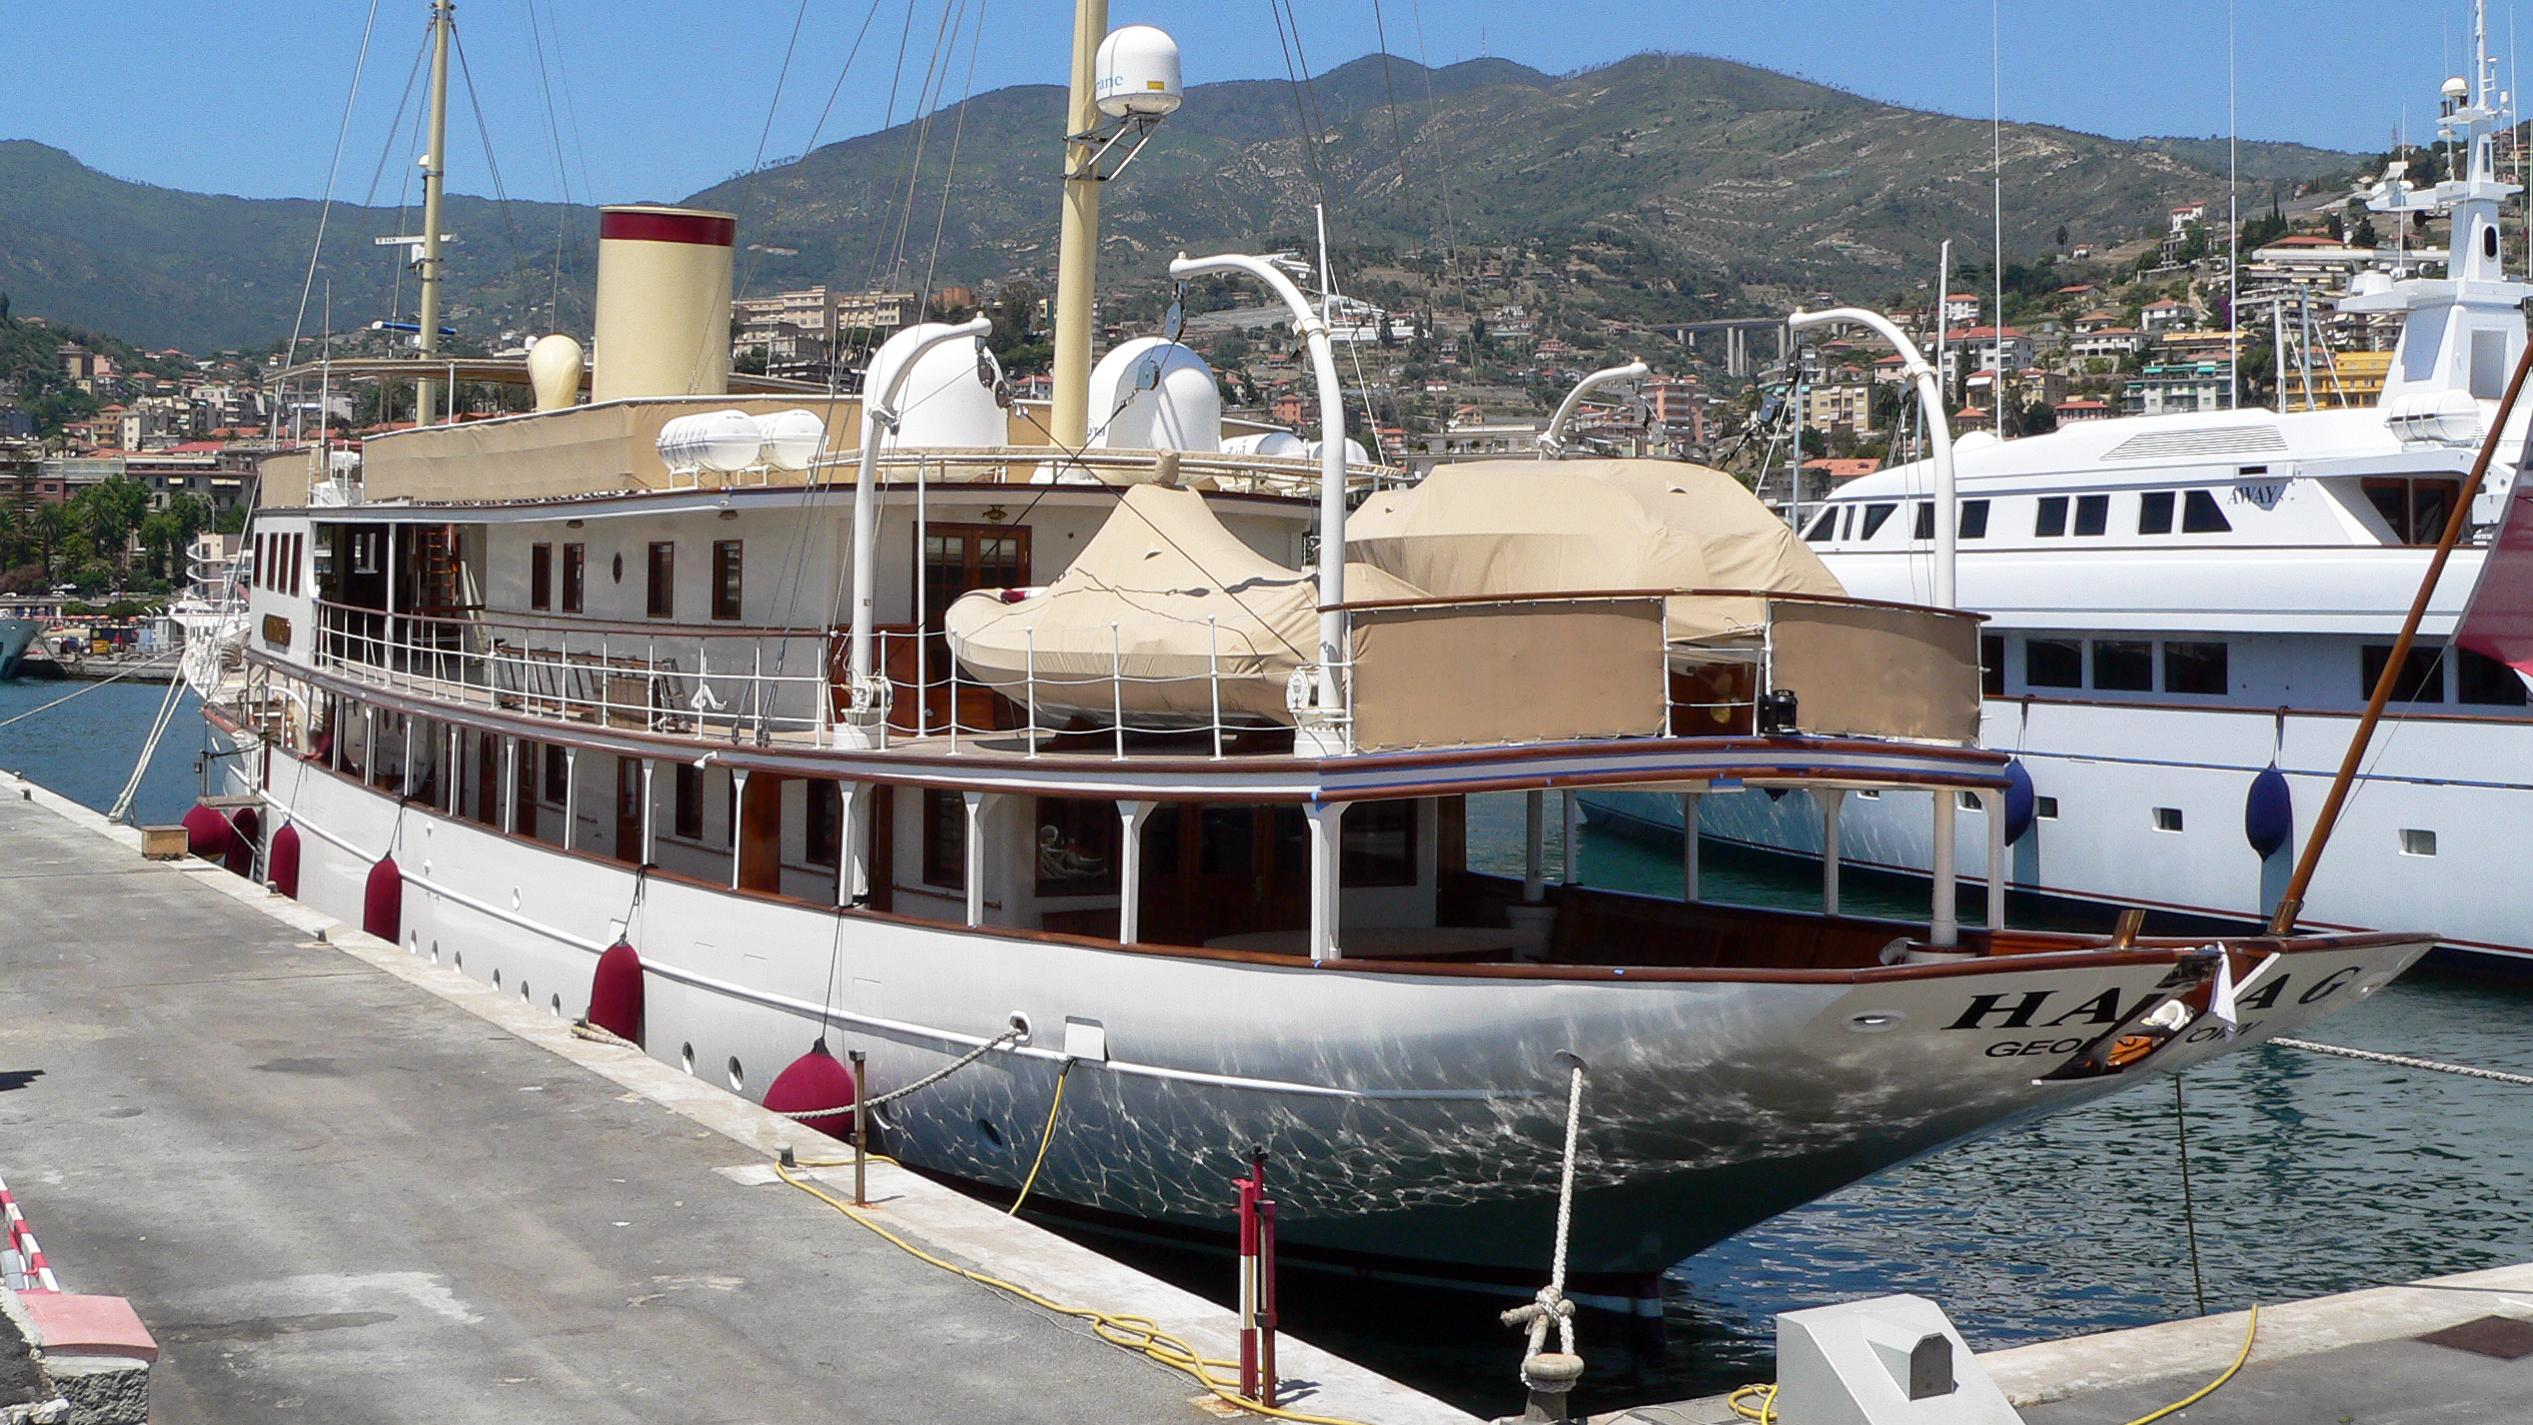 haida-1929-dona-amelia-motor-yacht-krupp-germaniawerft-1929-71m-stern